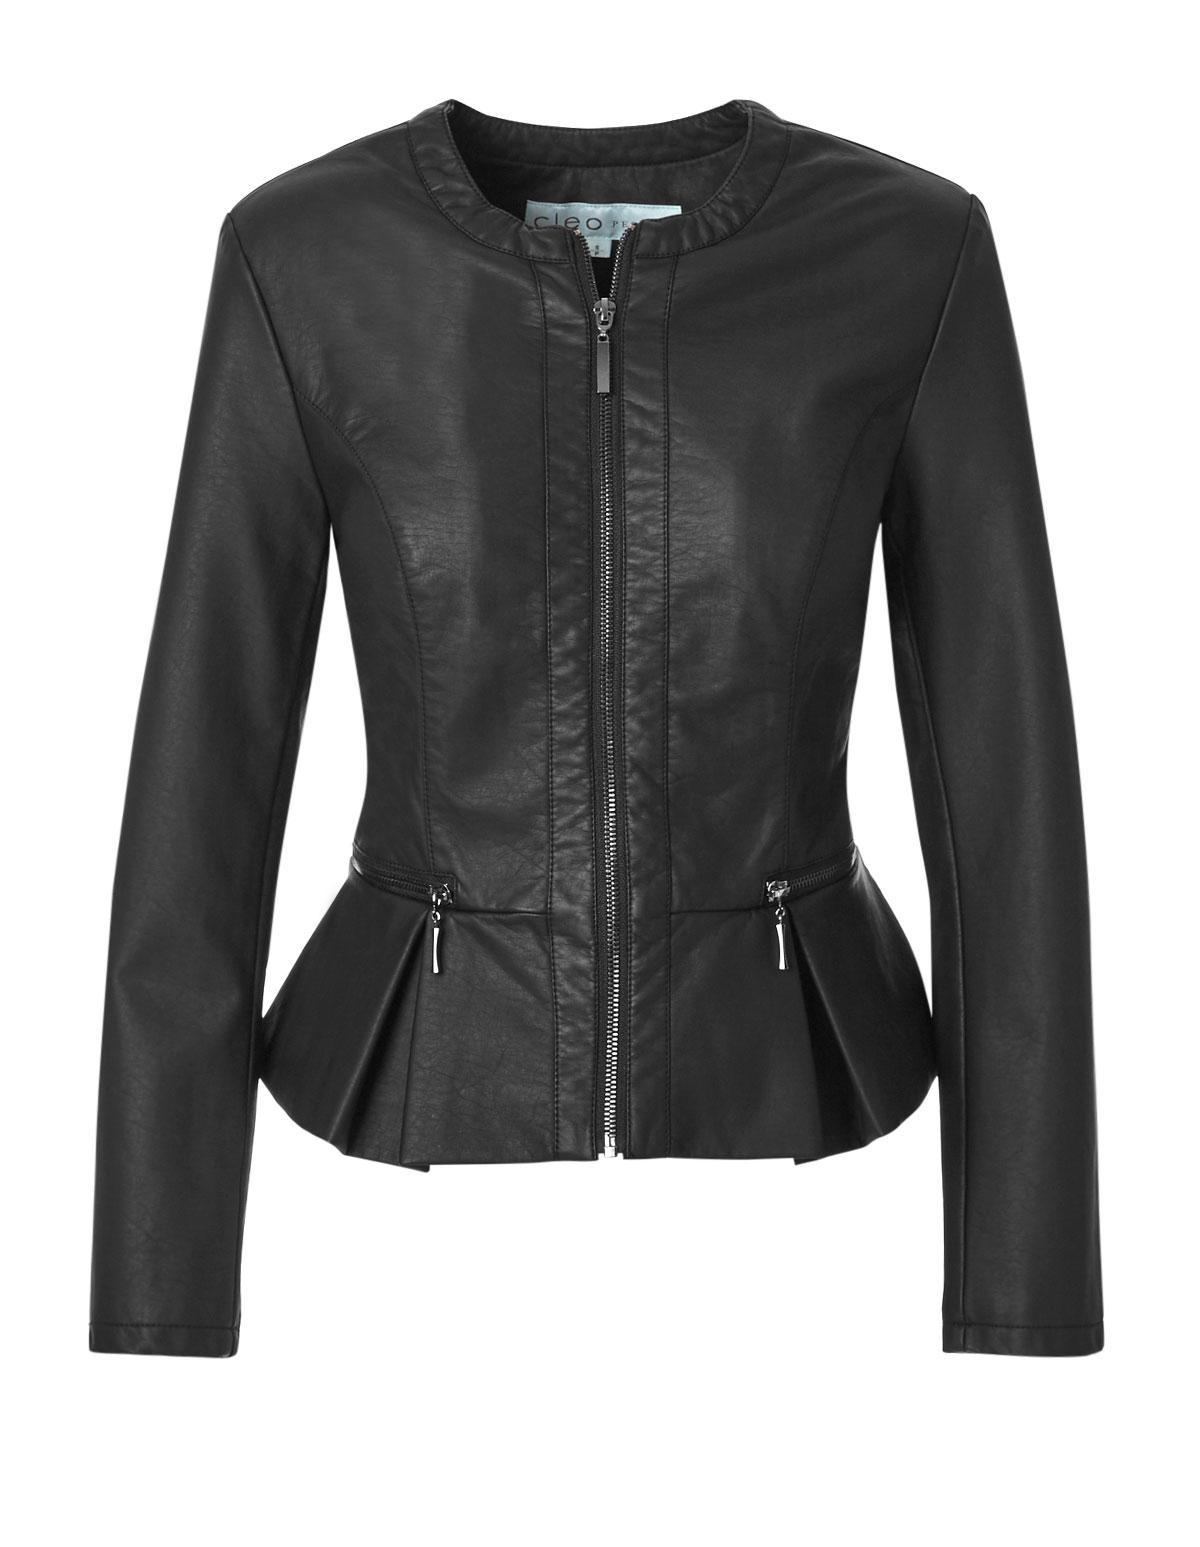 SportsX Womens Elegant Peplum Notch Collar Zip Faux Leather Jackets